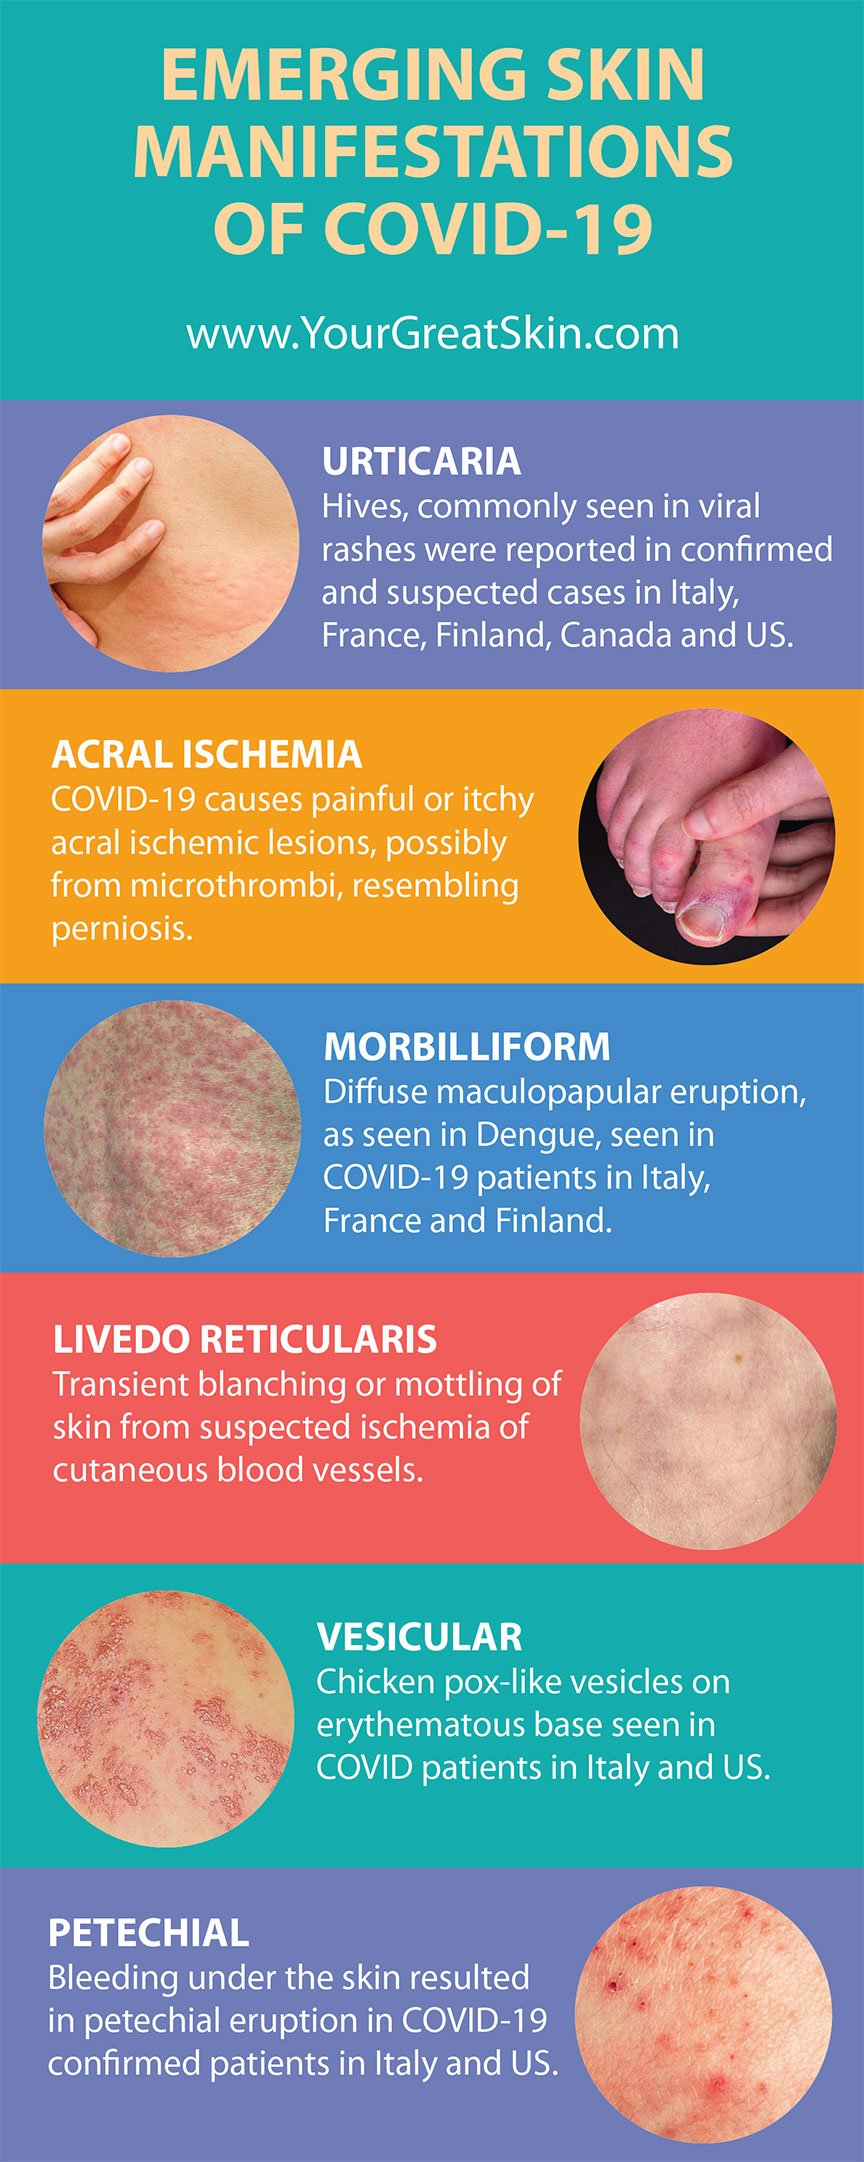 Emerging skin manifestations of Covid-19